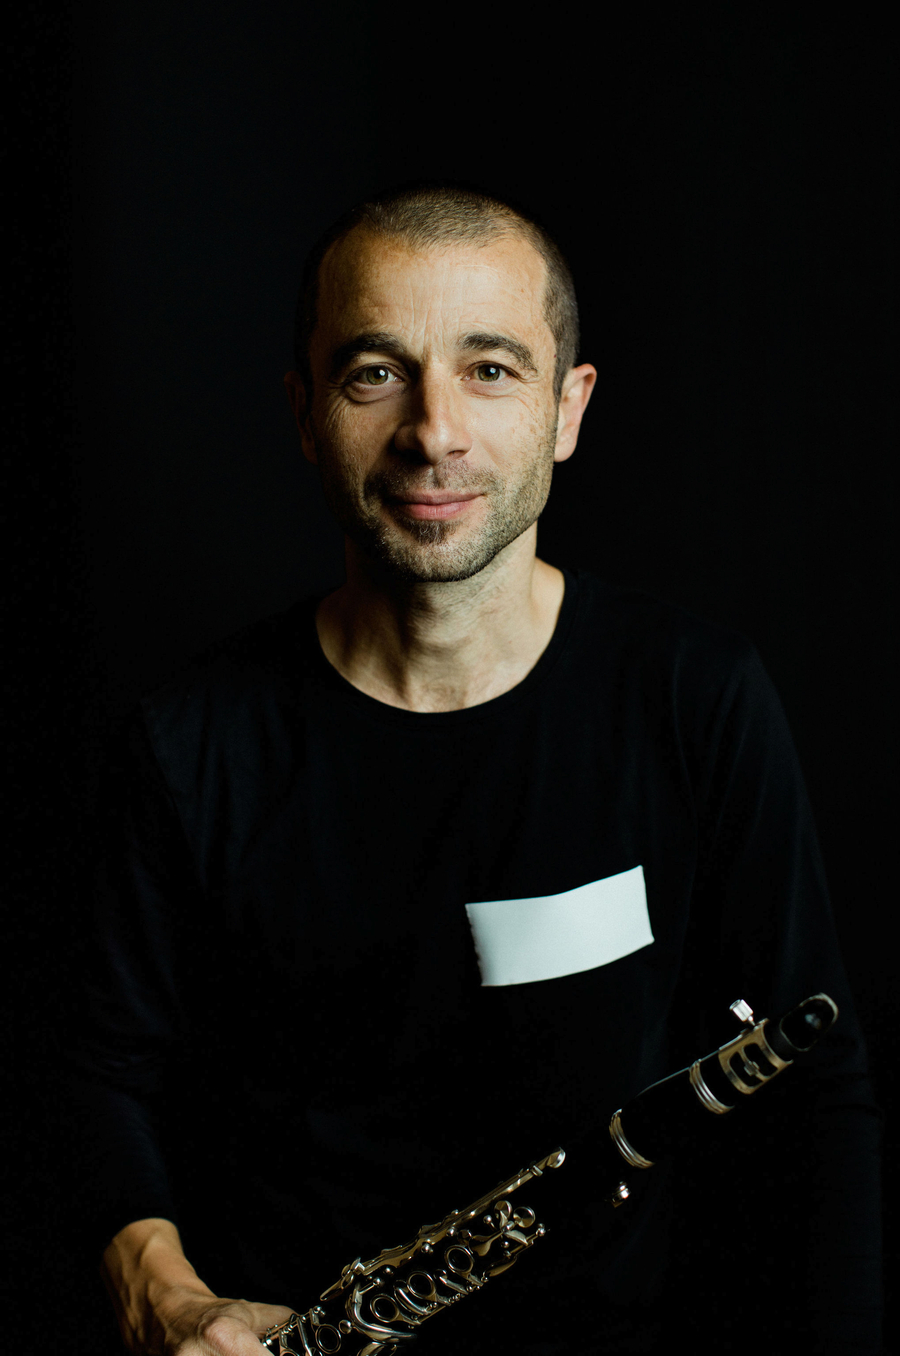 Johannes Eder